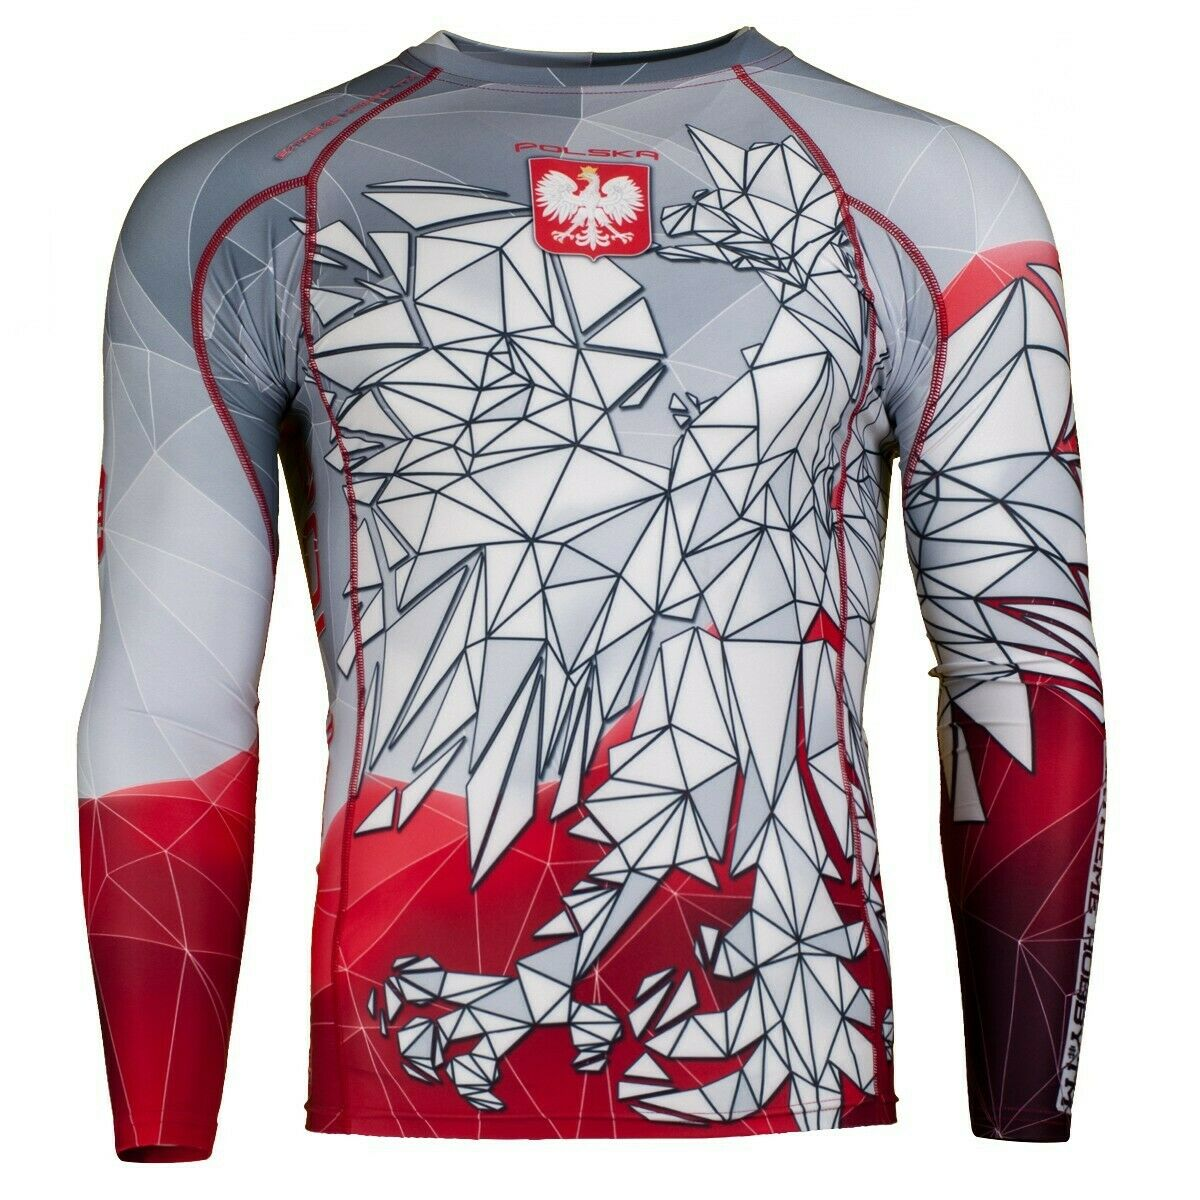 Longsleeve rashguard POLSKA grey-red Extreme  Hobby Training&GYM MMA BBJ  fashion brands